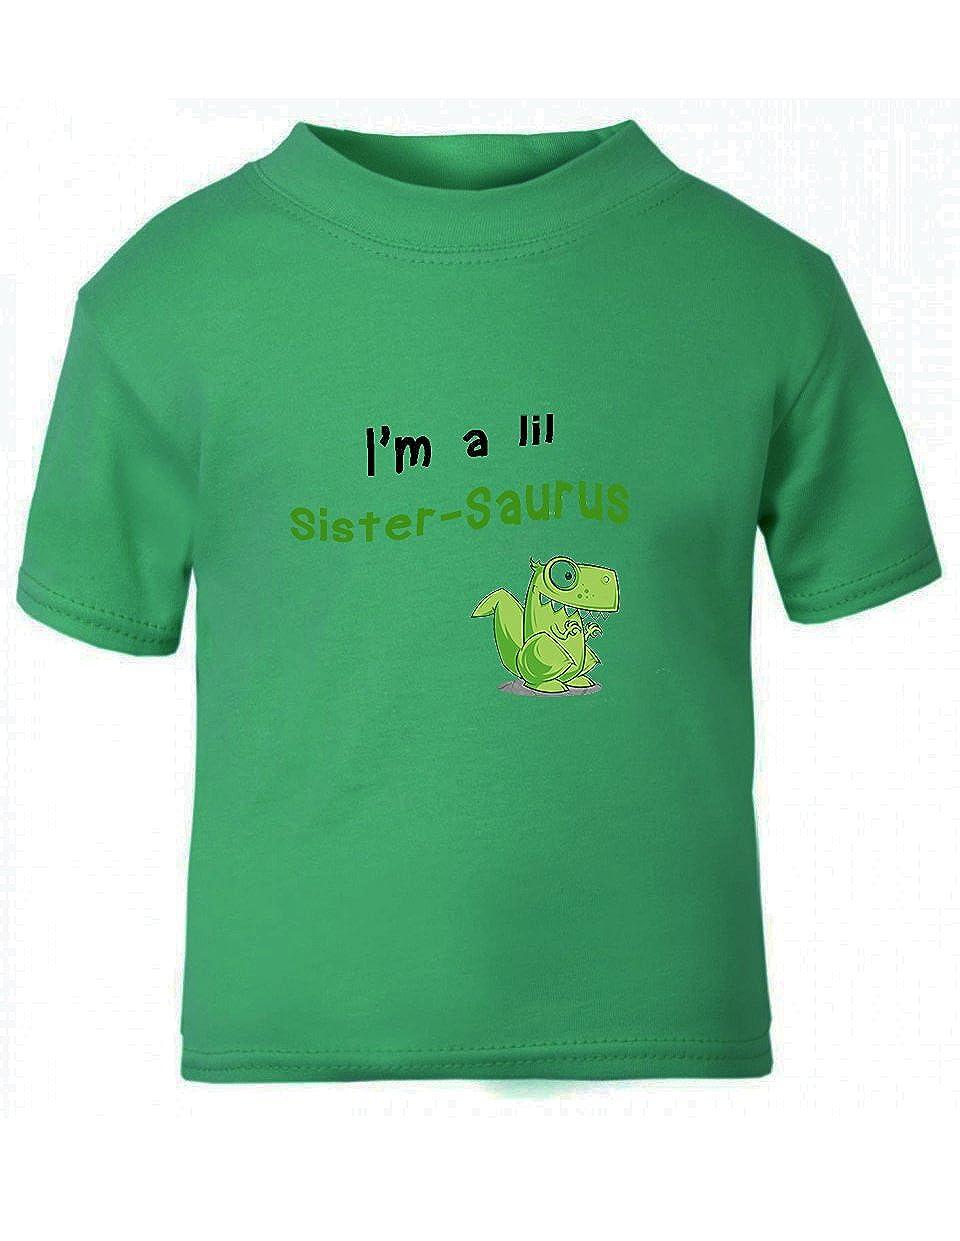 Green Dinosaur Dino Little Sister-saurus Toddler Kid T-shirt Tee 6mo Thru 7t TTANI0048